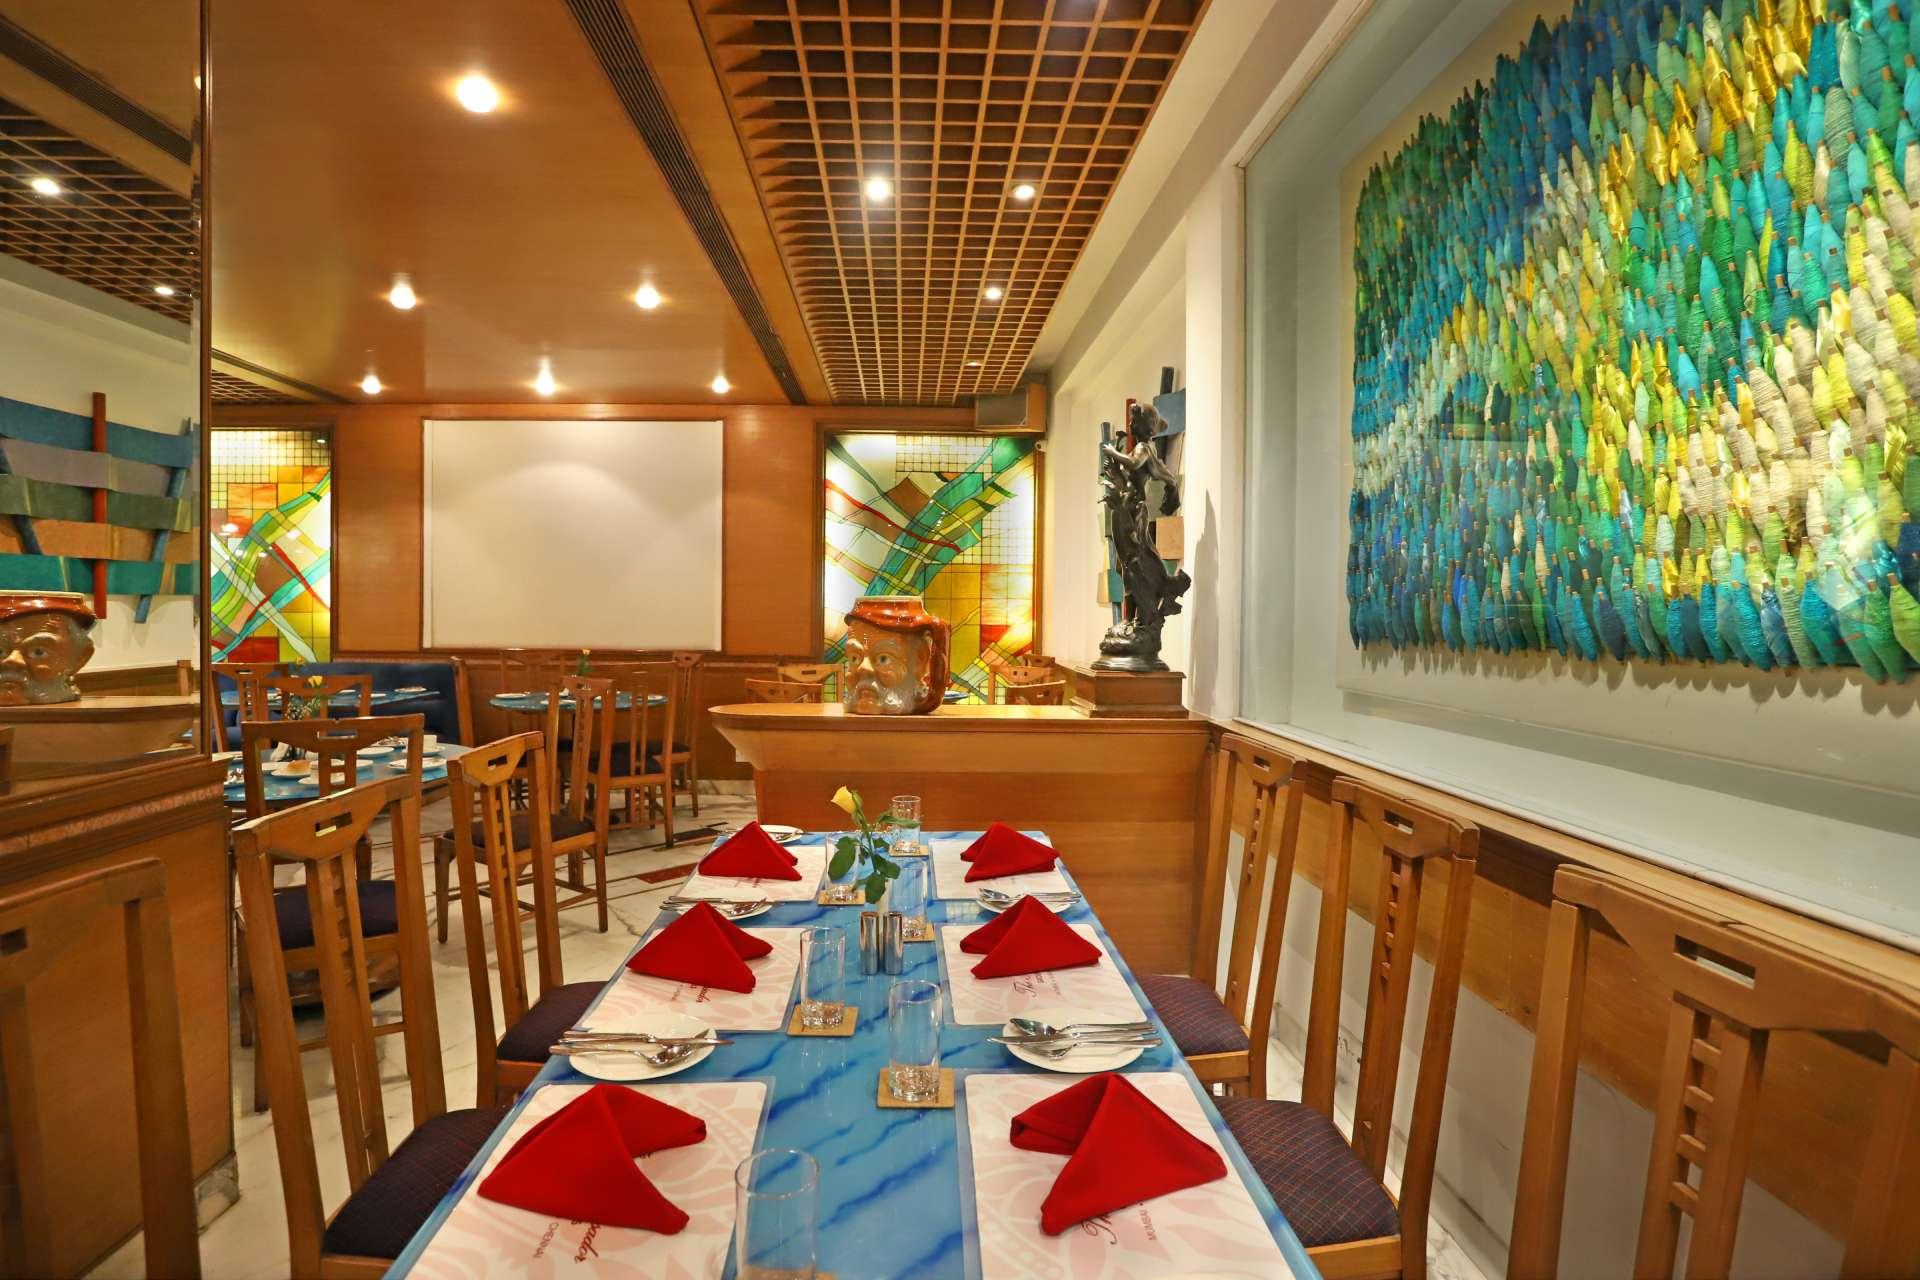 7 Flavors - The Ambassador | Heritage Hotels in Mumbai, Aurangabad, Chennai - Flavors Cafe